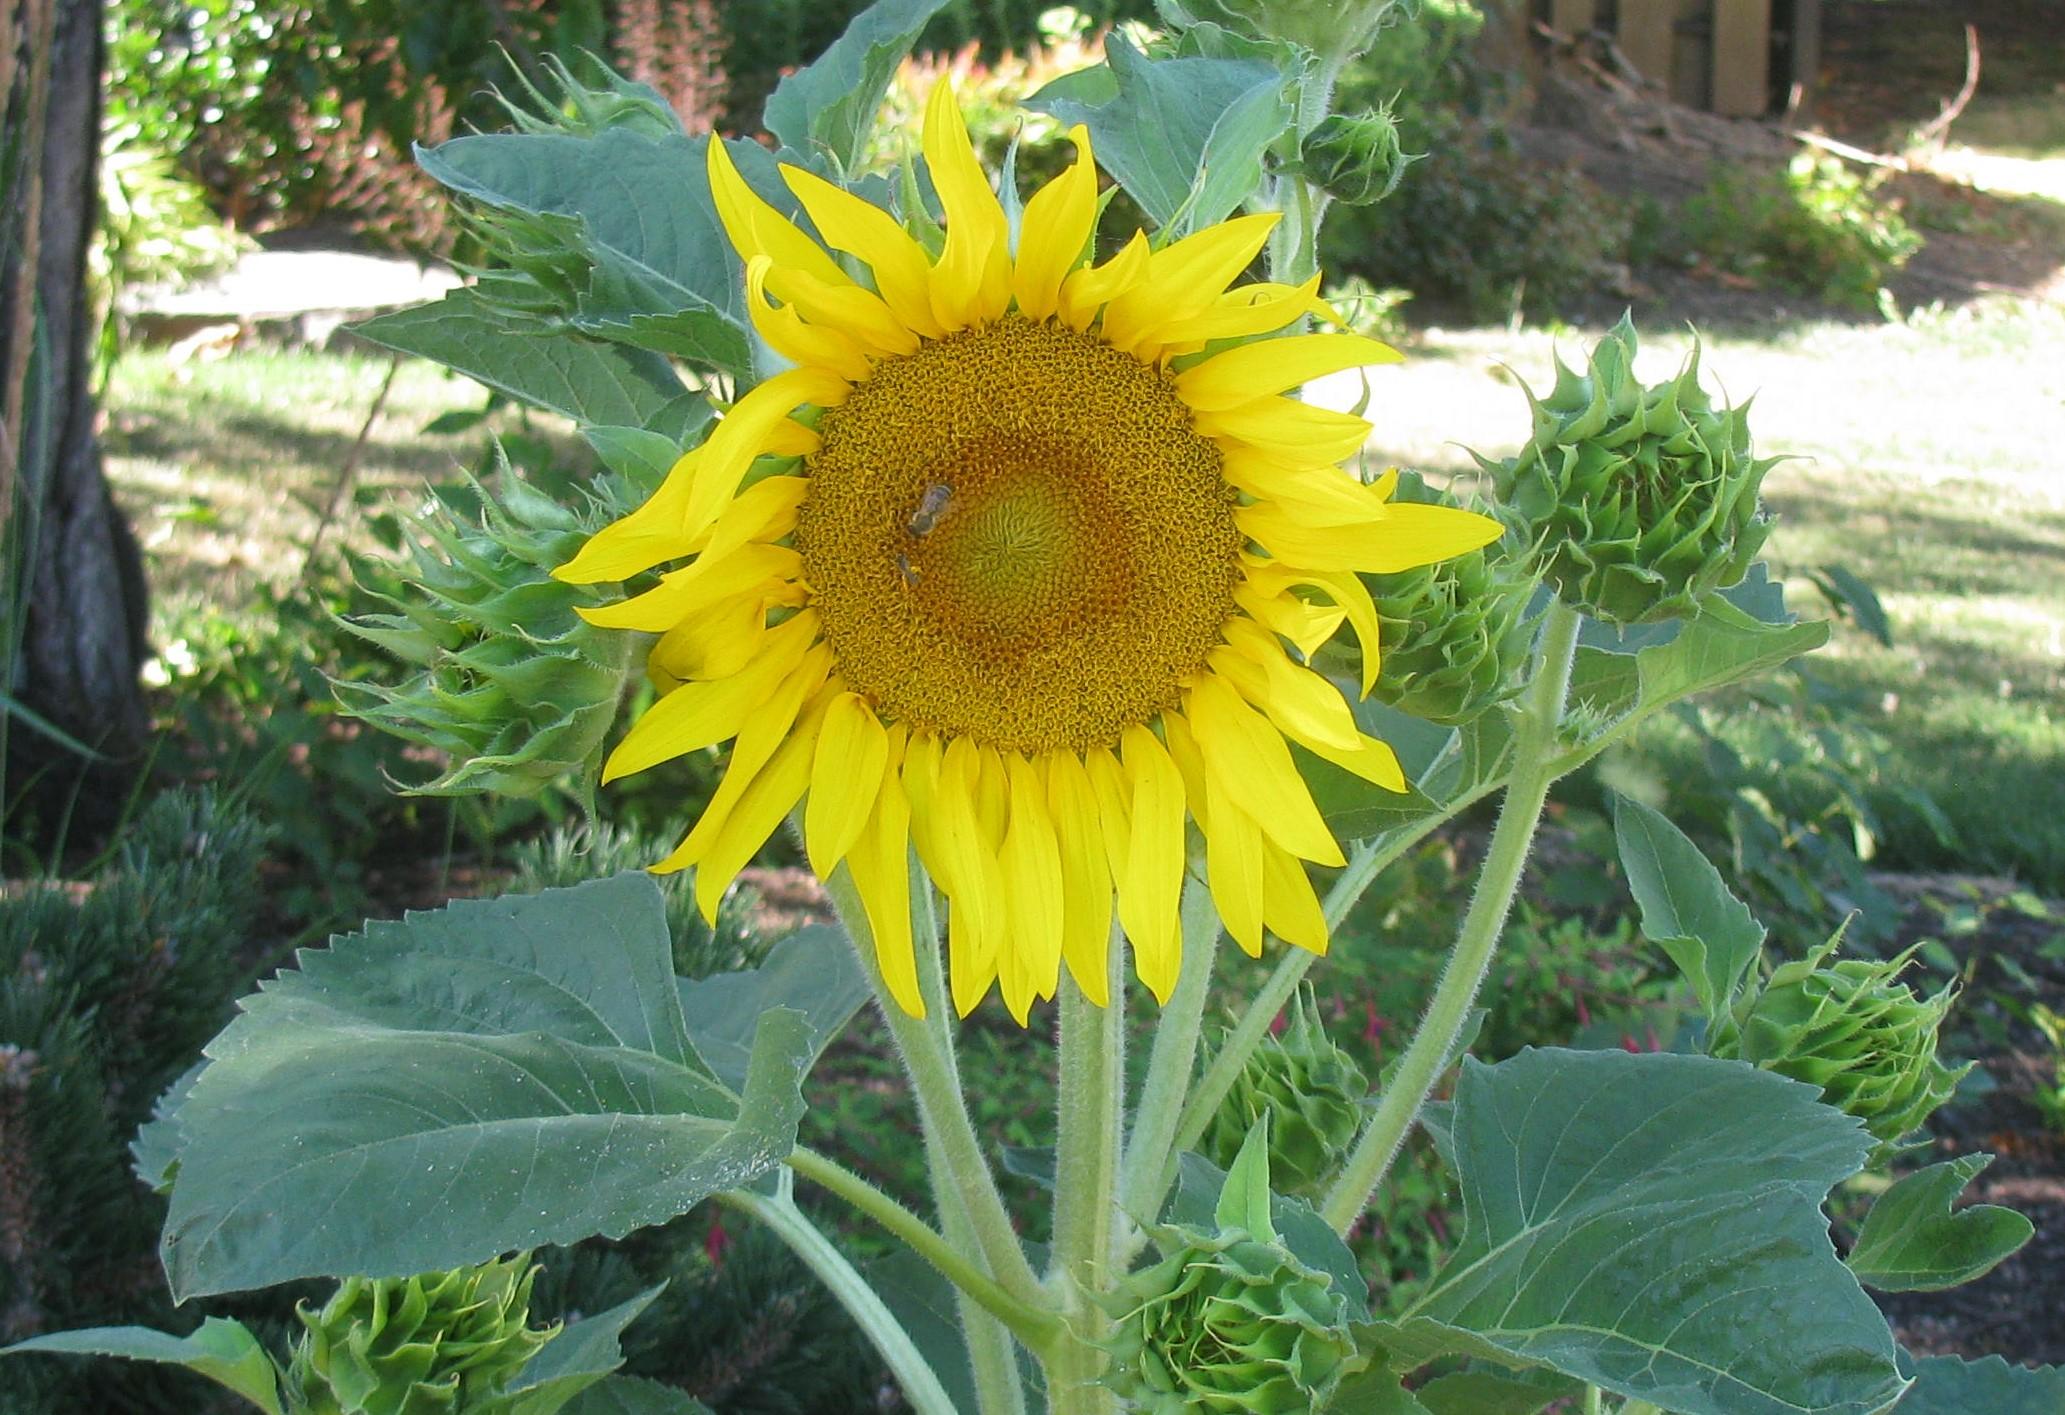 Sunflower on Wander Nature